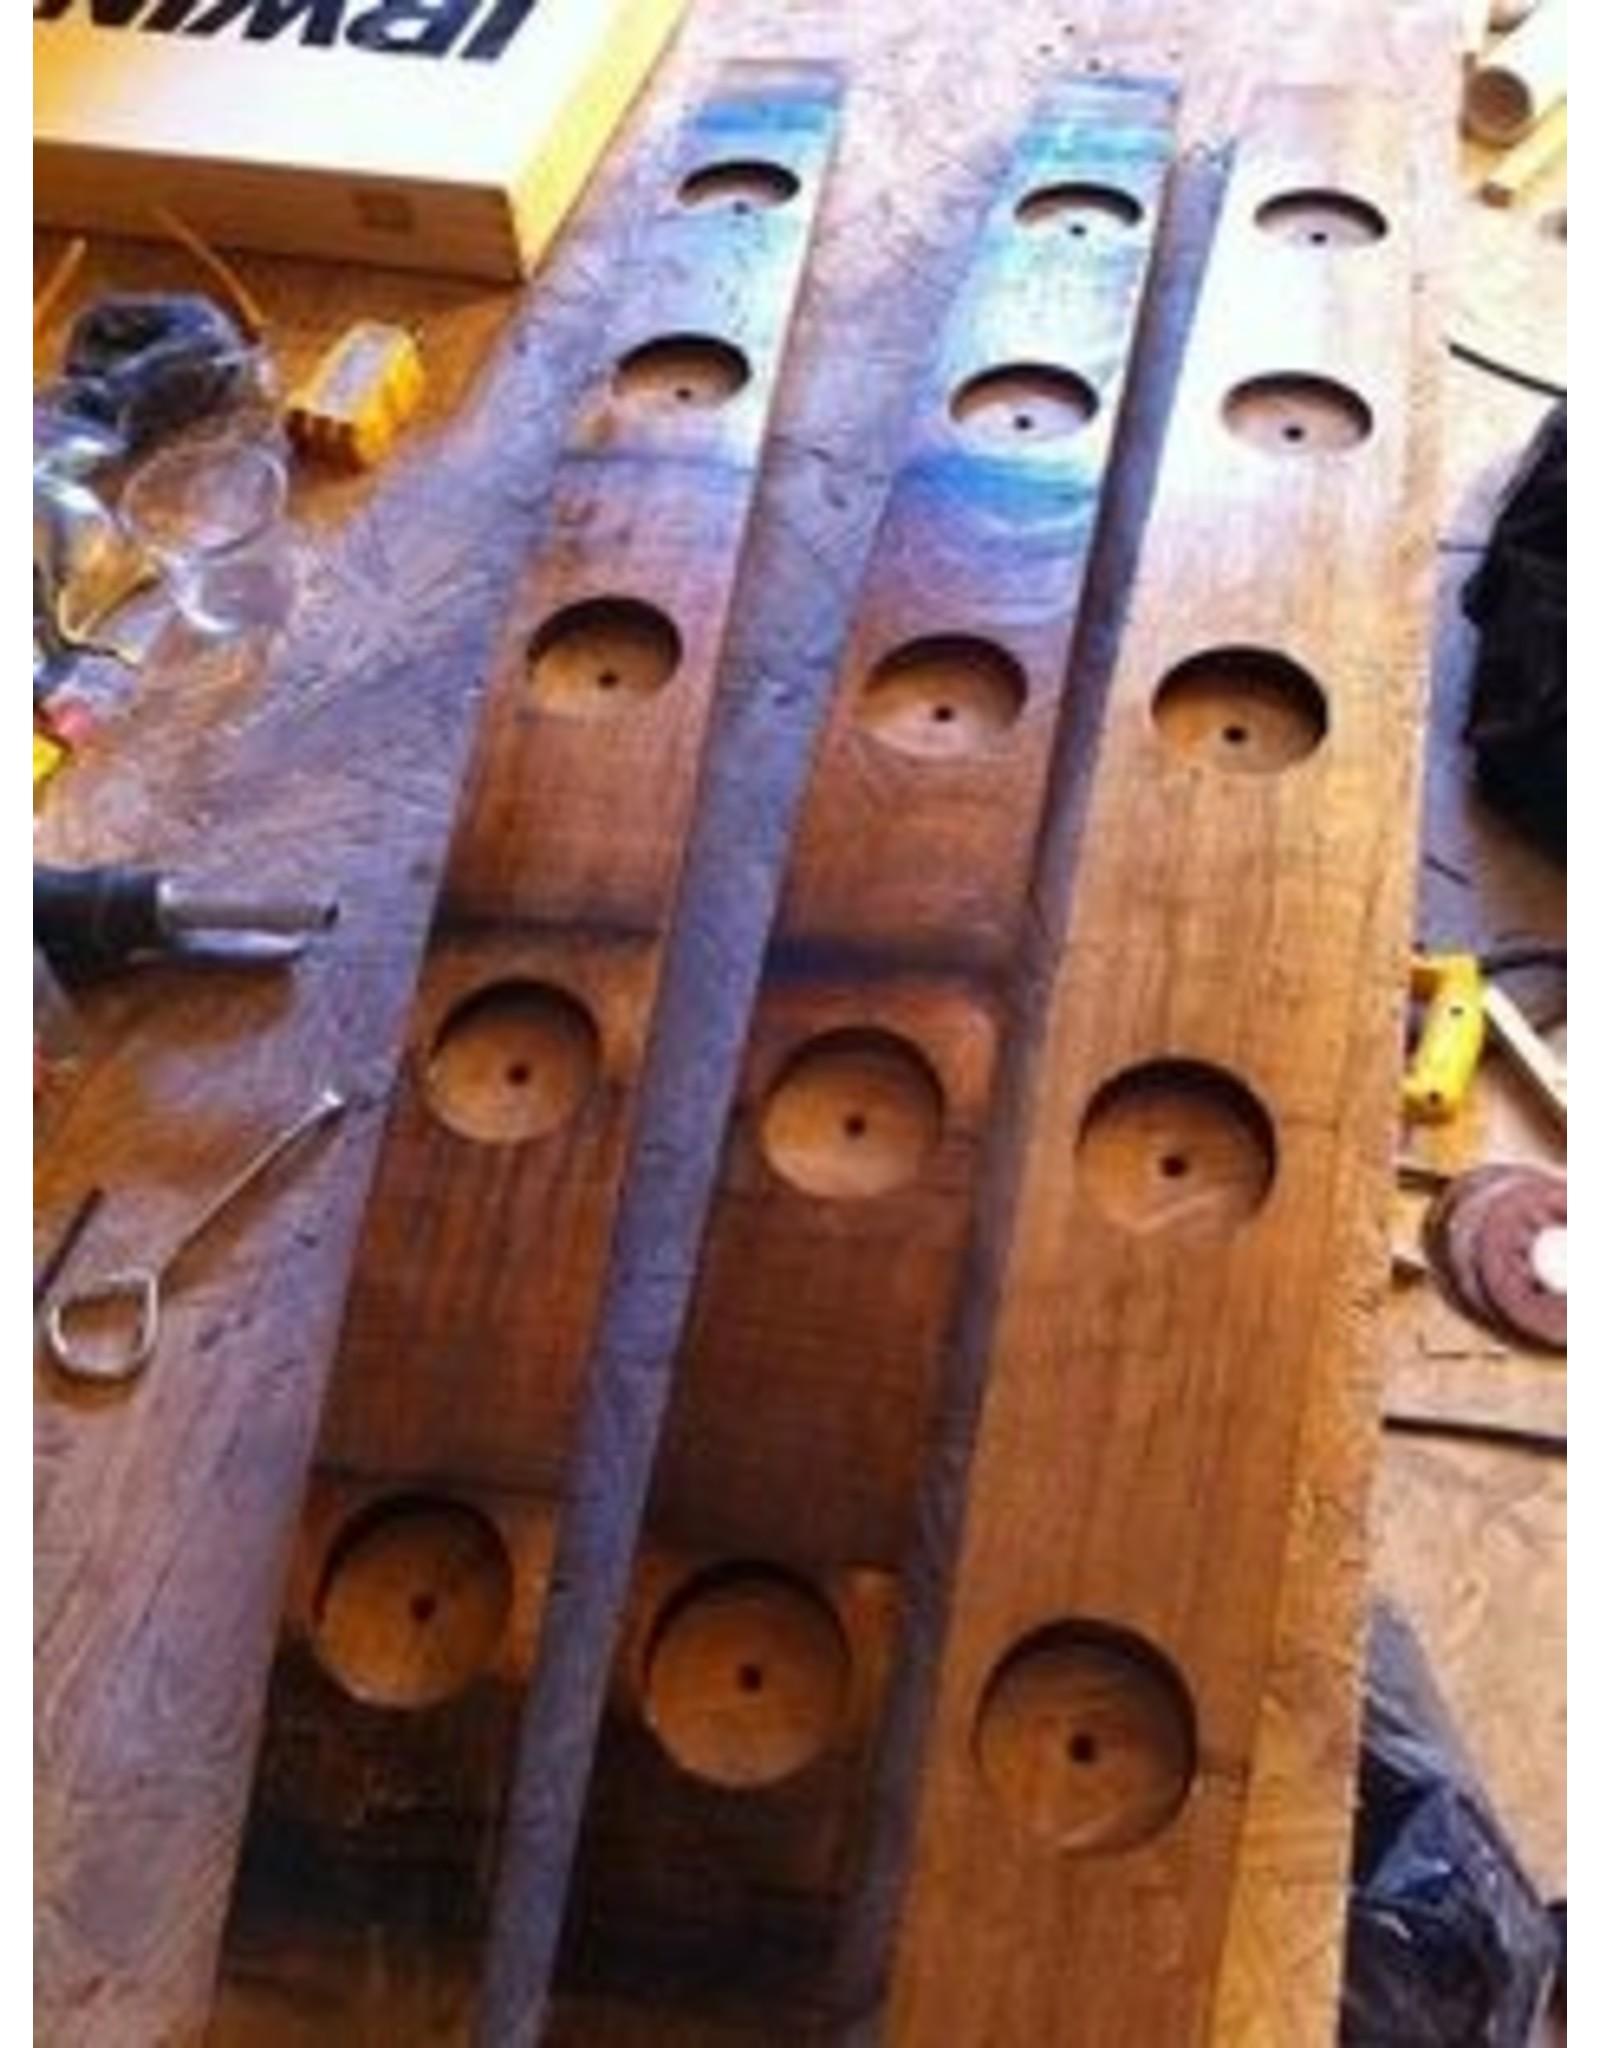 Daryl's Barrels Barrel Candle Holder